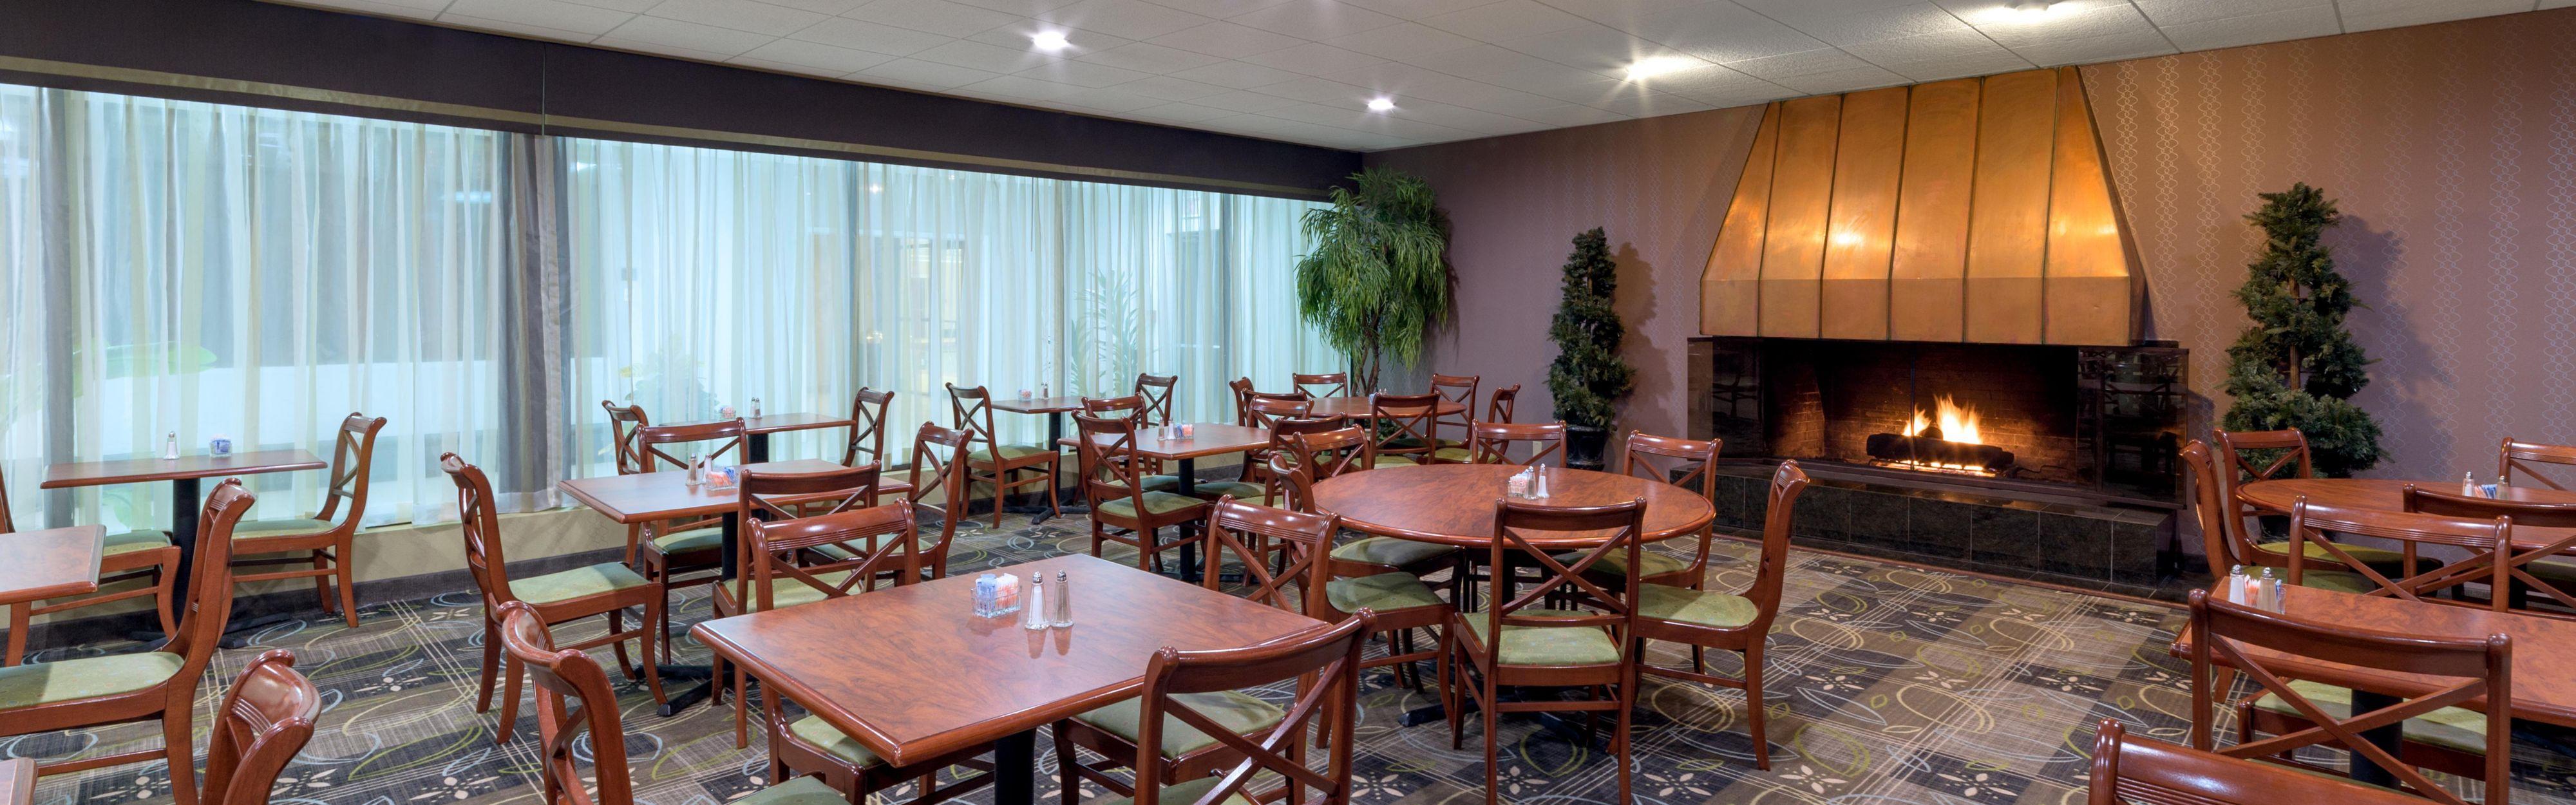 Holiday Inn Plattsburgh (Adirondack Area) image 3